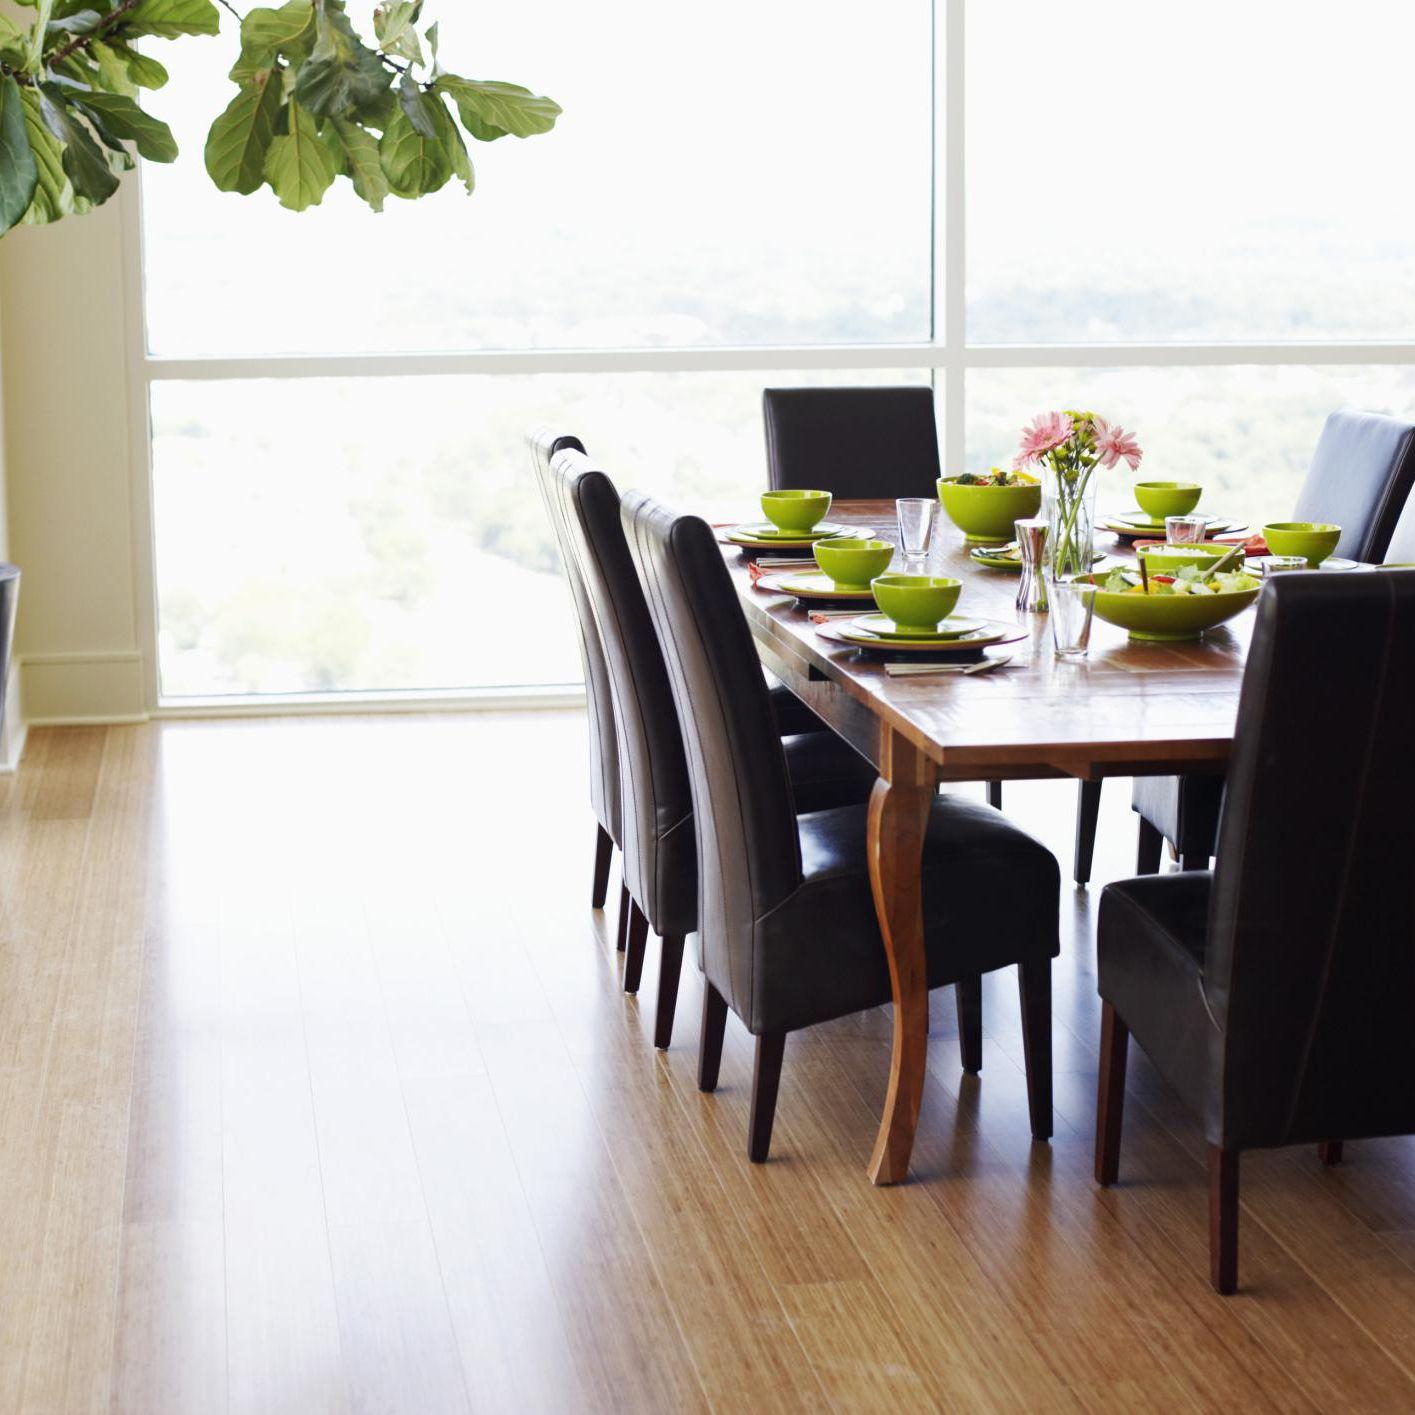 Waterproof Laminate Flooring Pros And Cons, Water Resistant Laminate Flooring Reviews